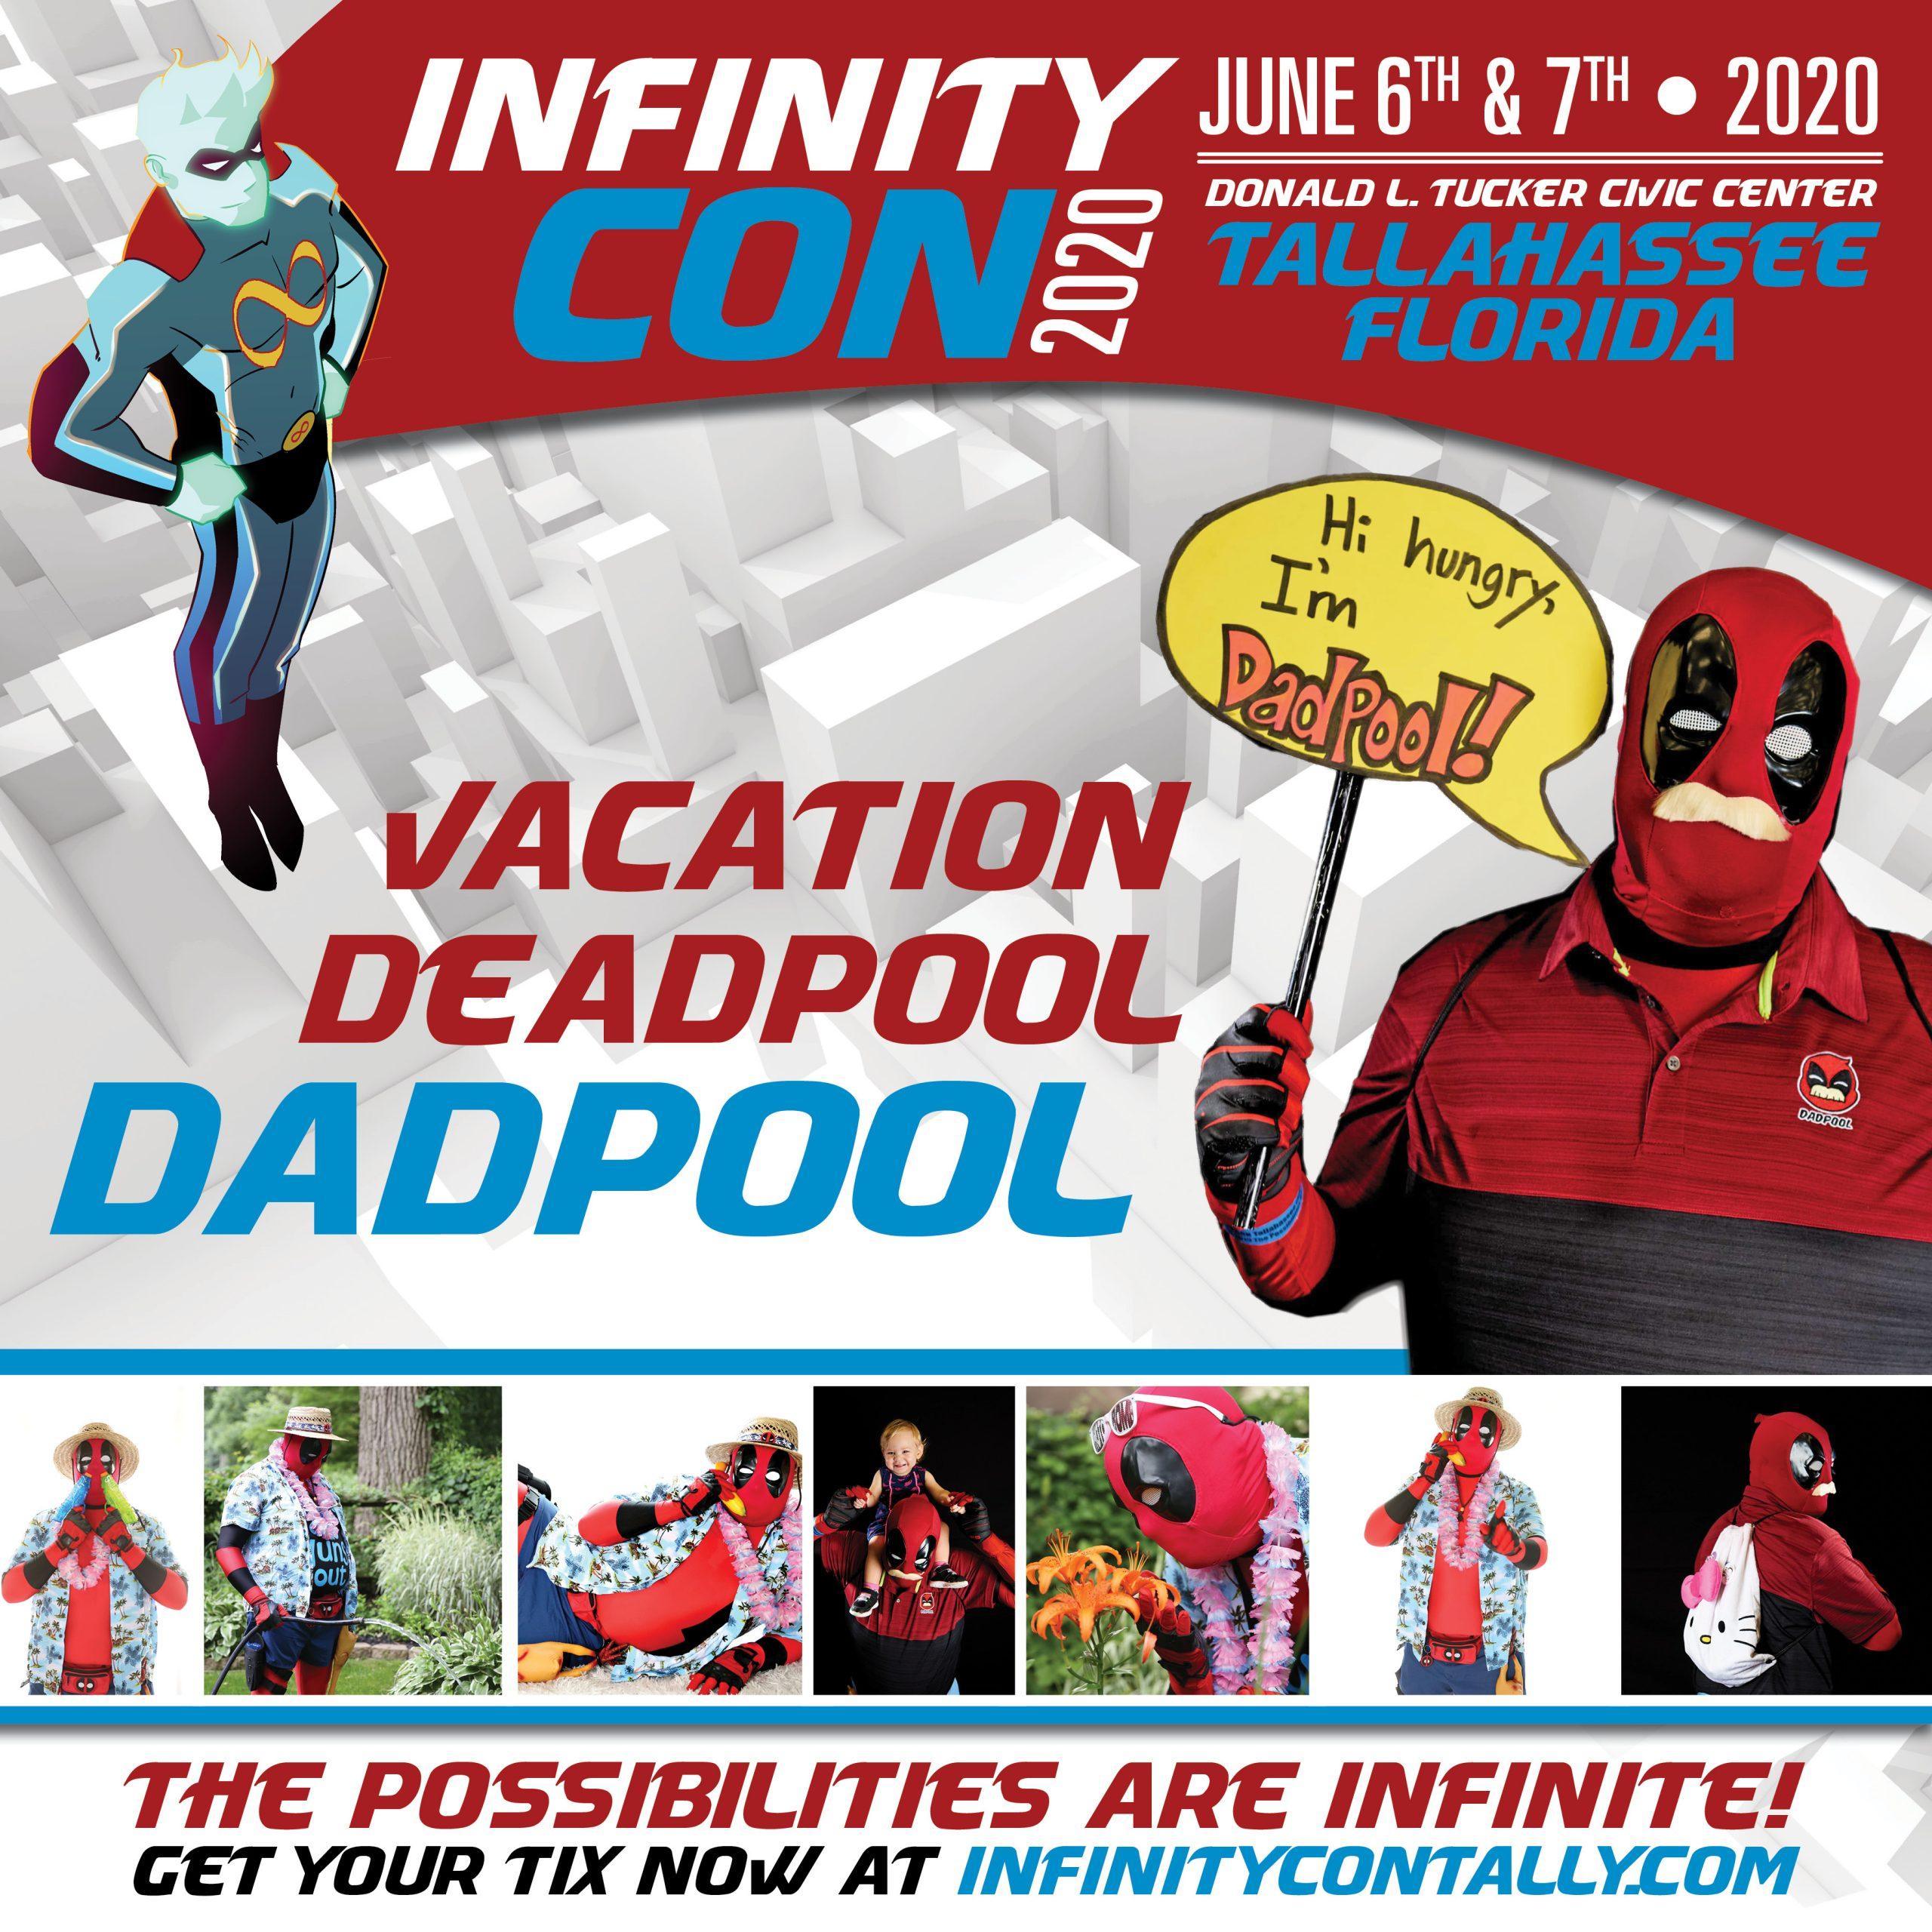 Vacation Deadpool/Dadpool